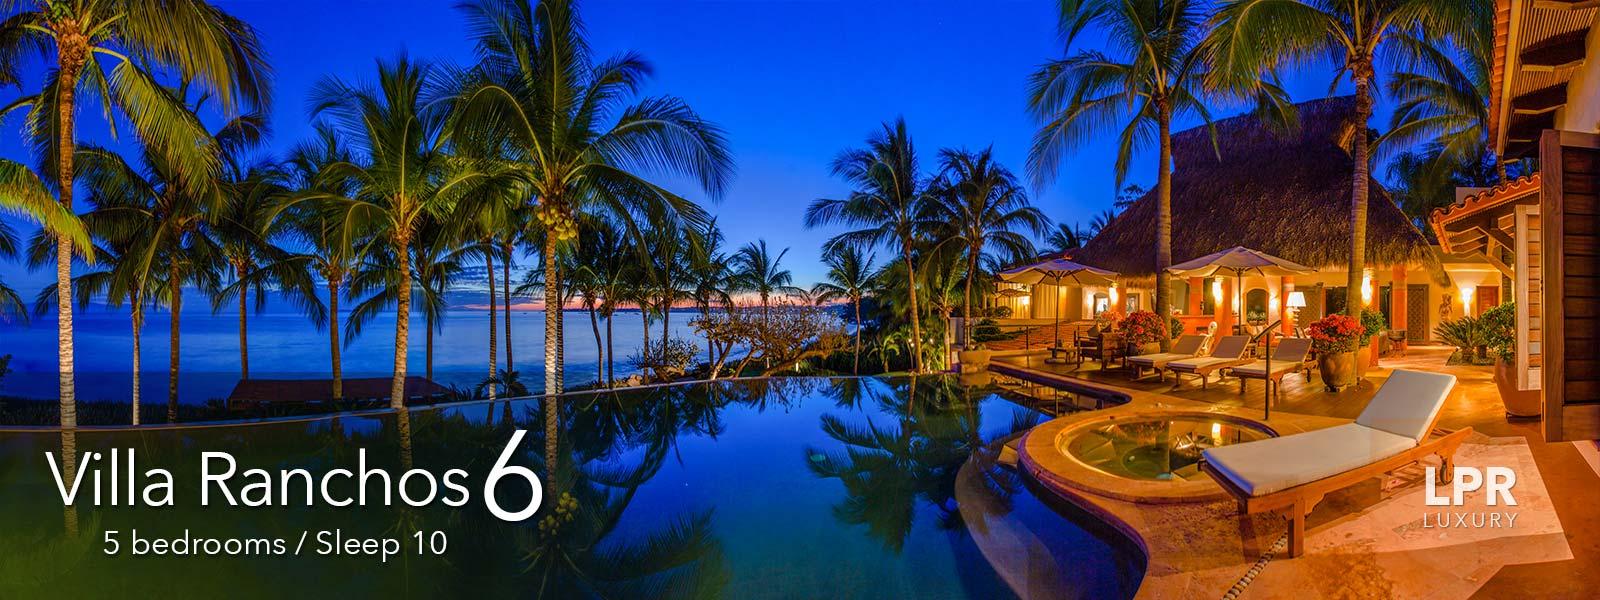 Villa Ranchos 6 - Punta Mita Resort - Riviera Nayarit, Mexico